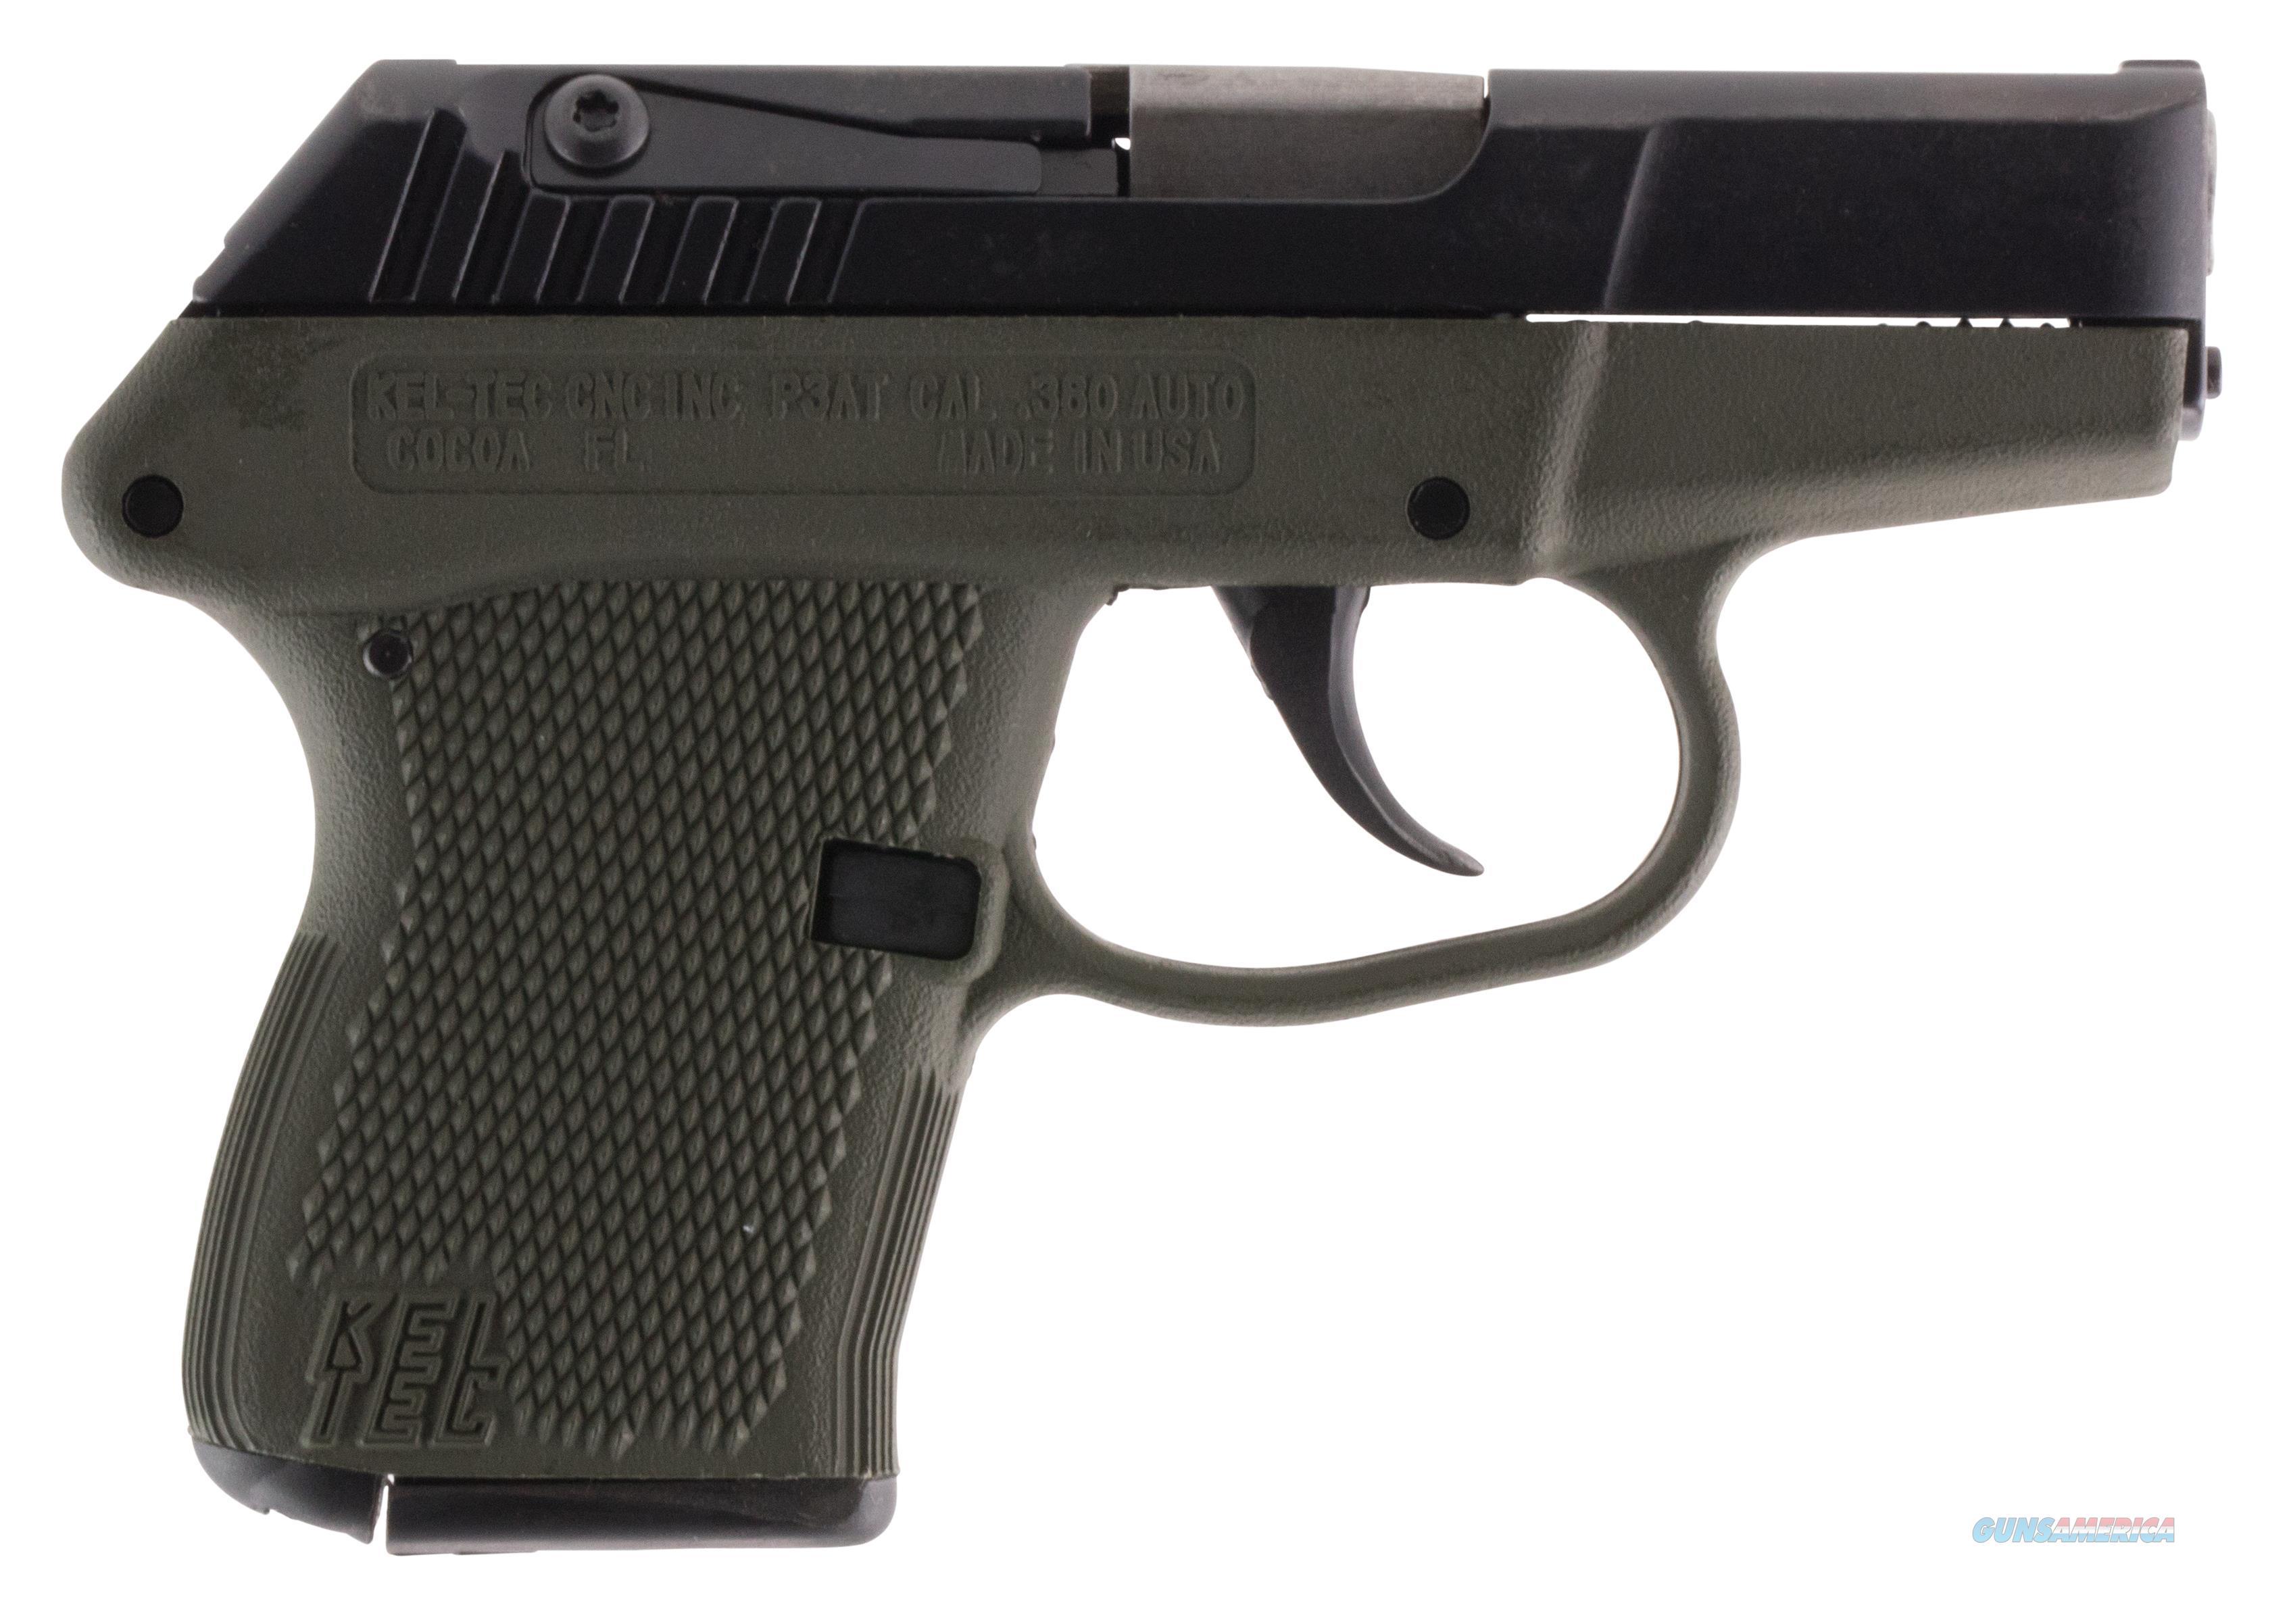 "Kel-Tec P3atbgrn P-3At 380 Acp Double 380 Automatic Colt Pistol (Acp) 2.7"" 6+1 Green Polymer Grip Blued P3ATBGRN  Guns > Pistols > K Misc Pistols"